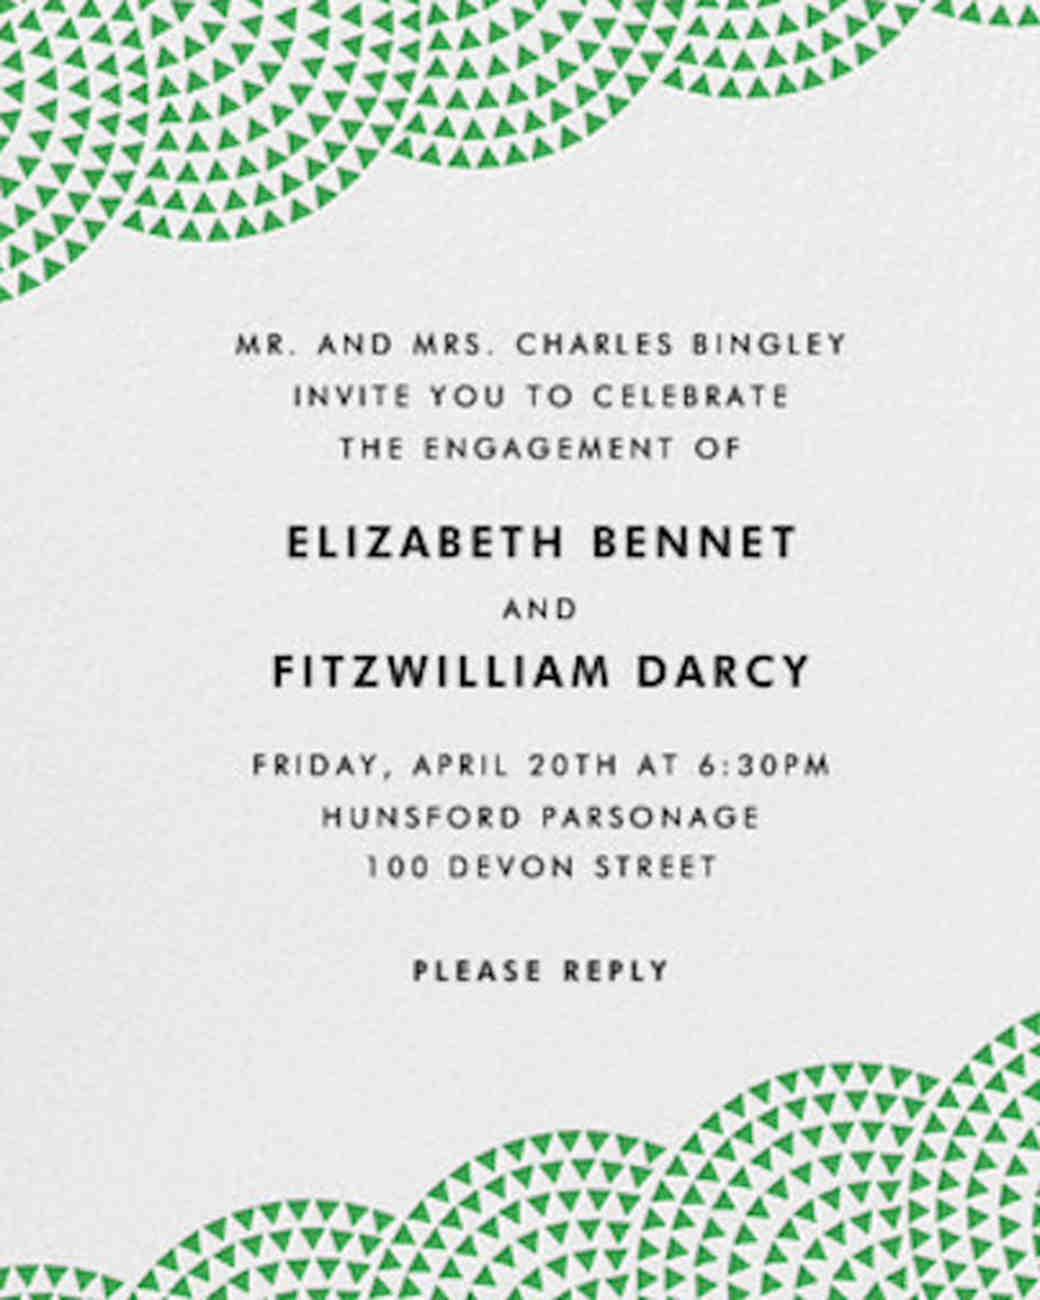 35 Paperless Engagement Party Invites | Martha Stewart Weddings